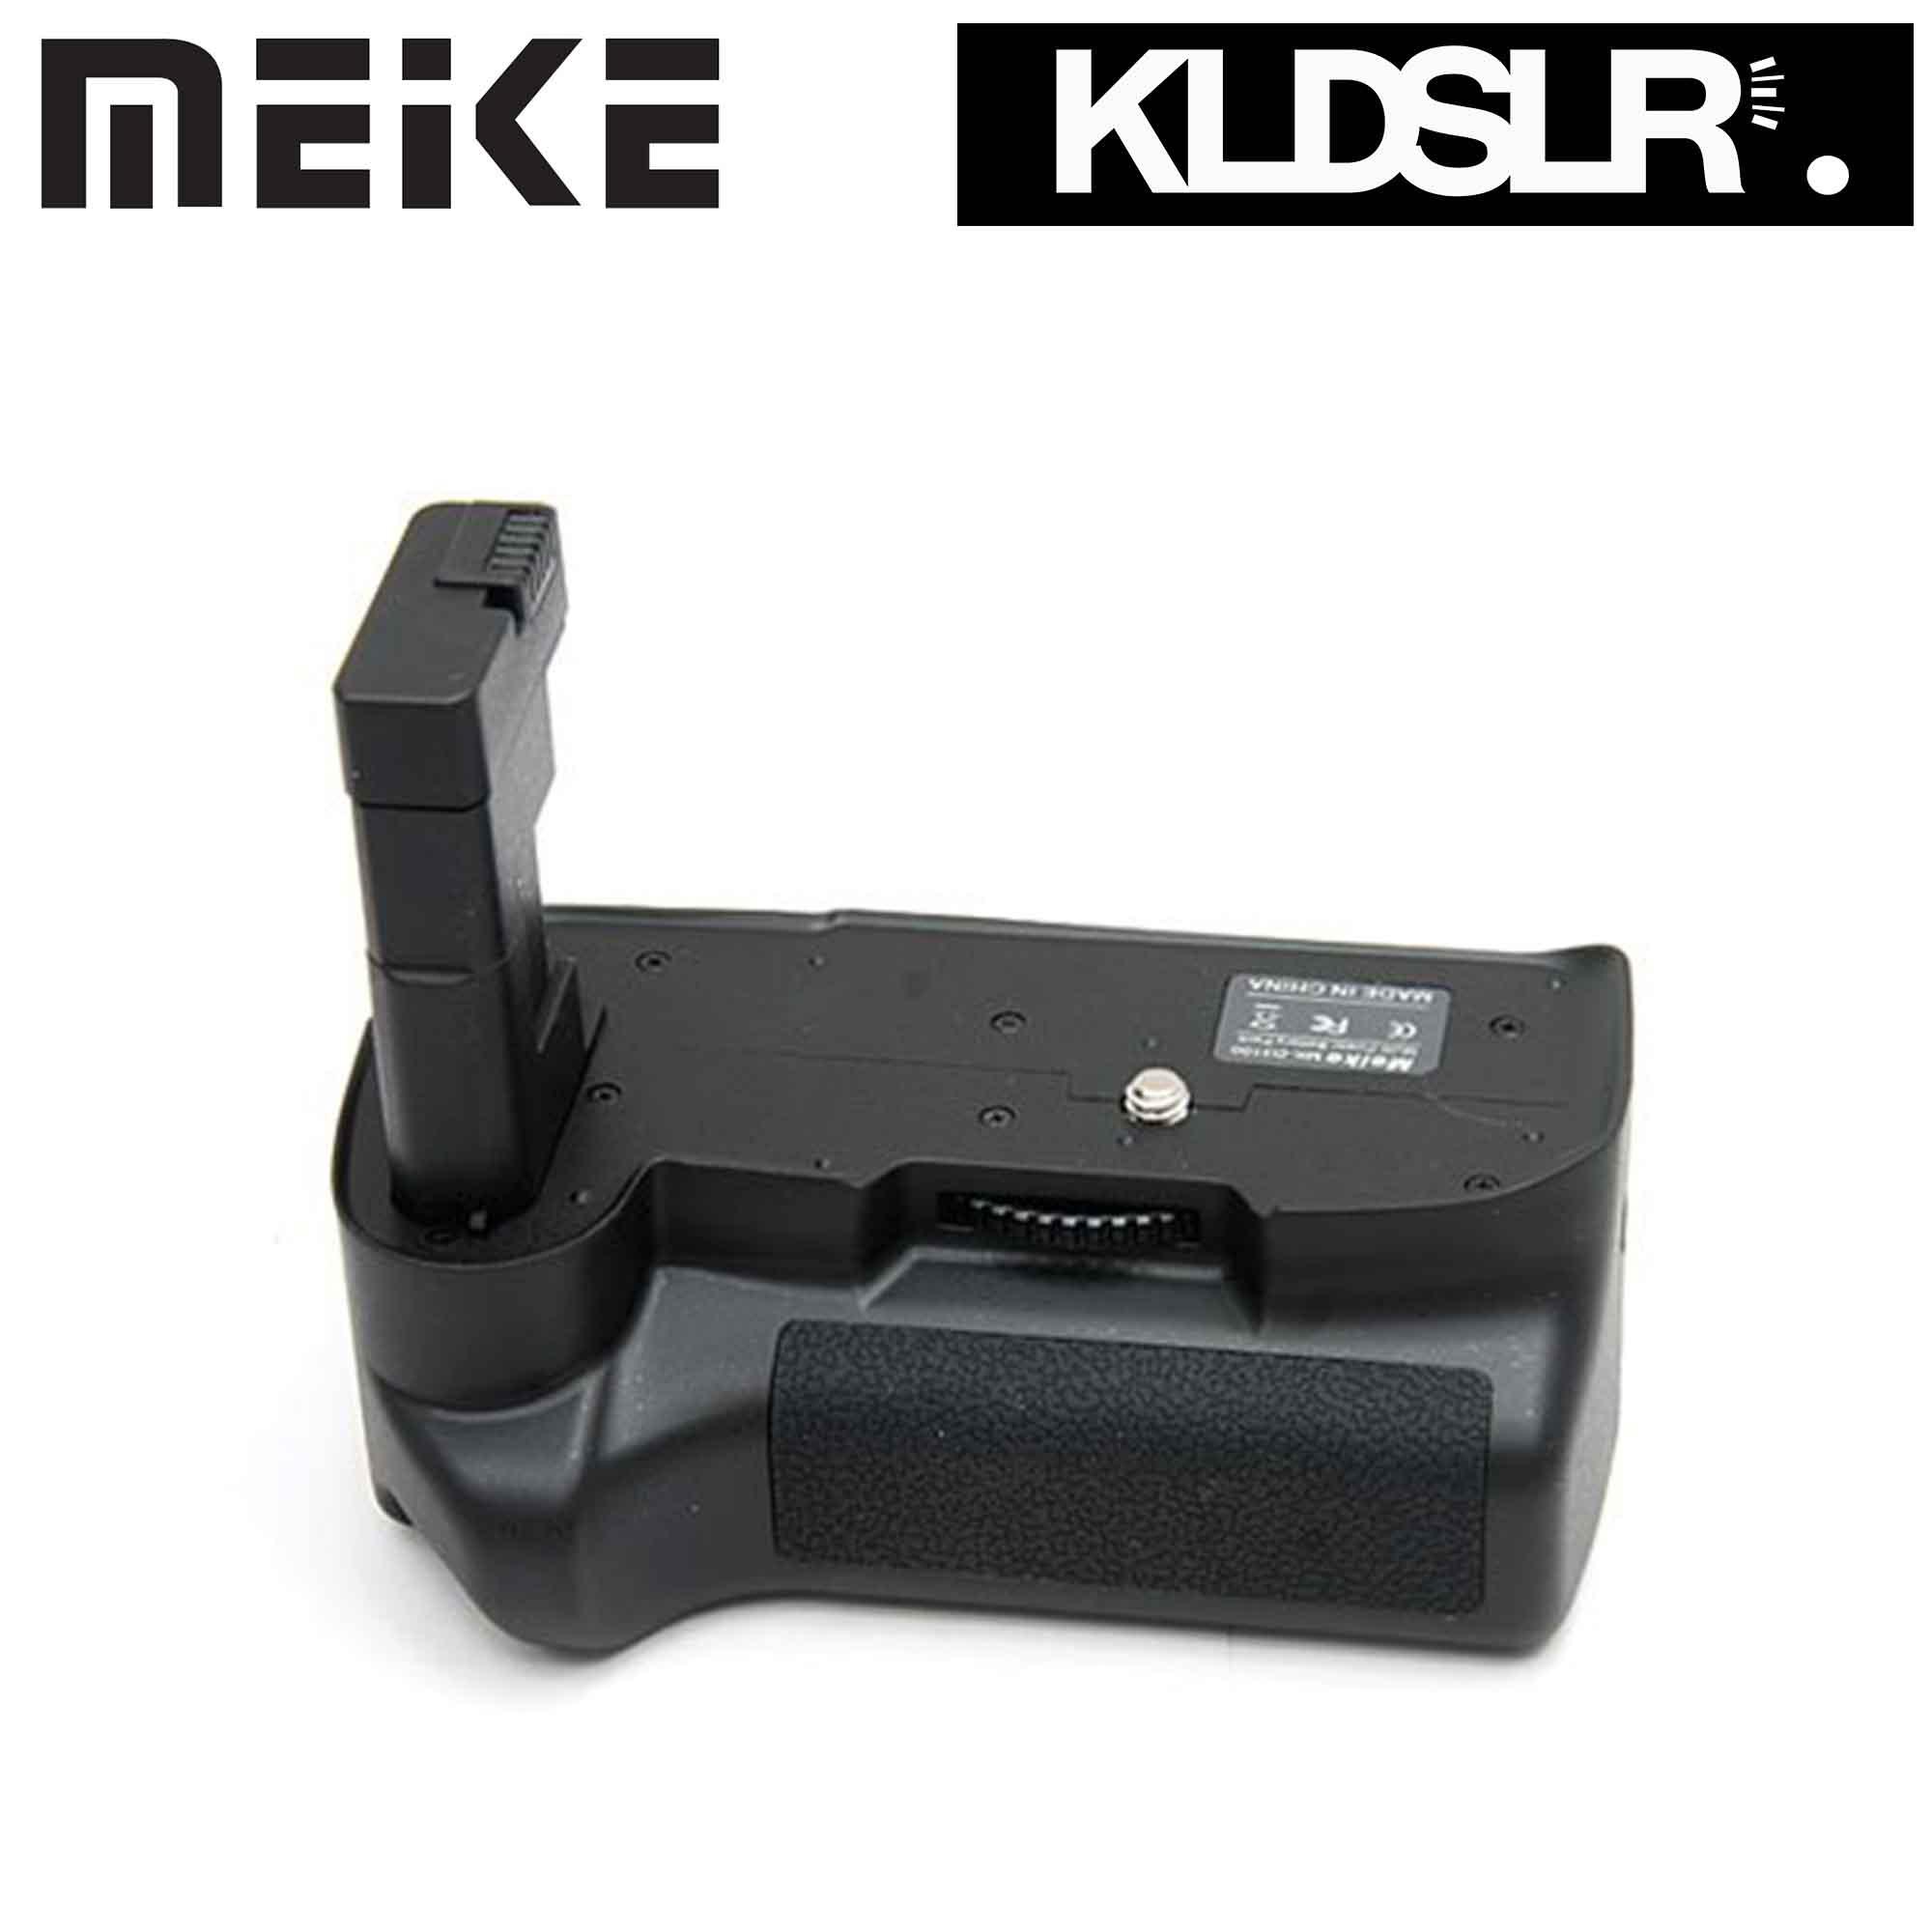 Meike Vertical Battery Grip for Nikon D3100 D3200 EN-EL14